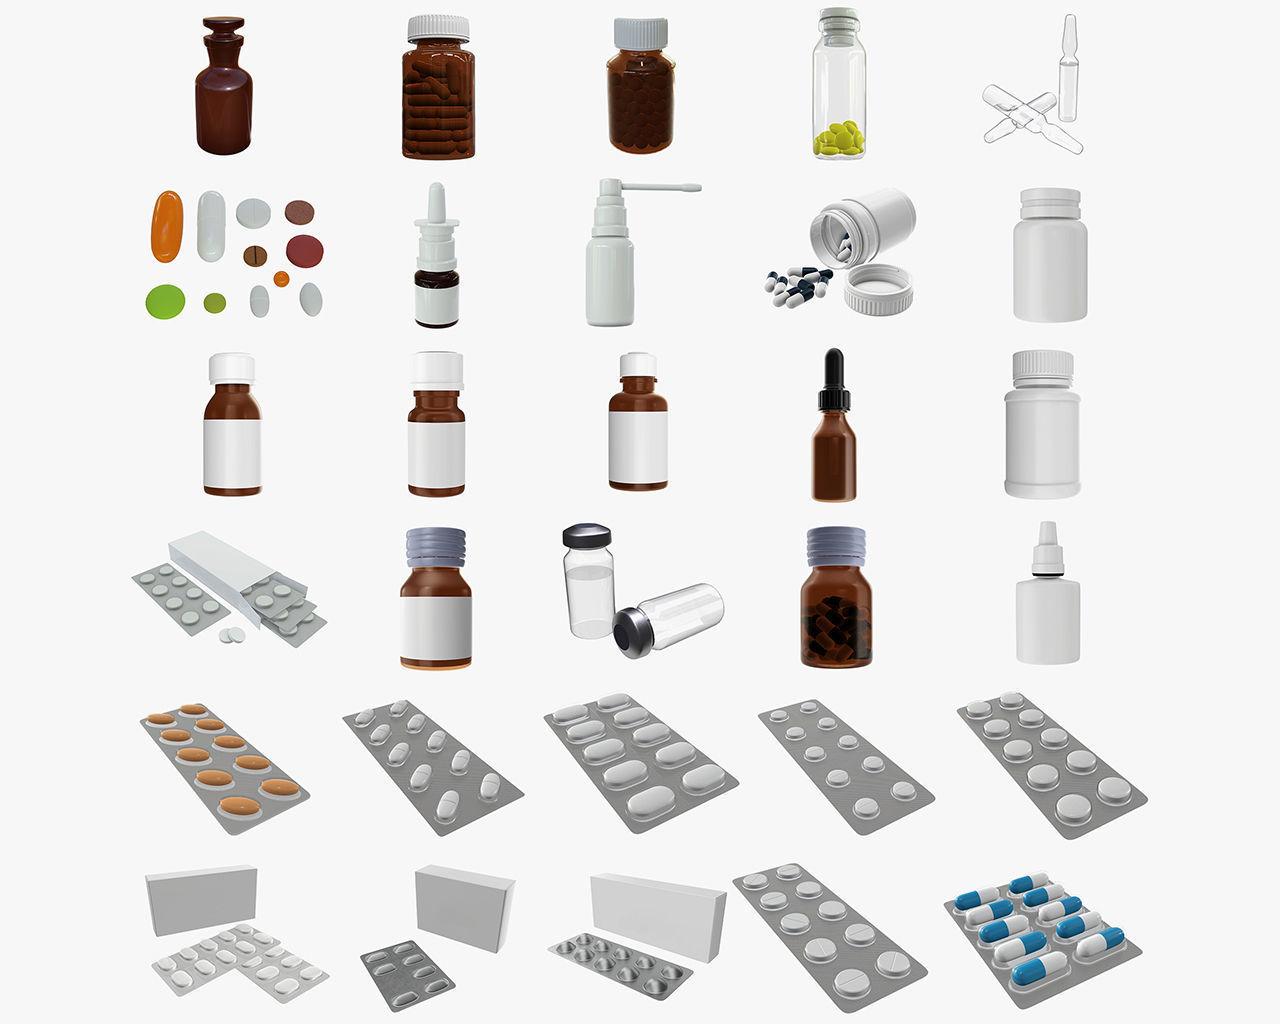 mock up glass plastic bottles pills blisters medicine